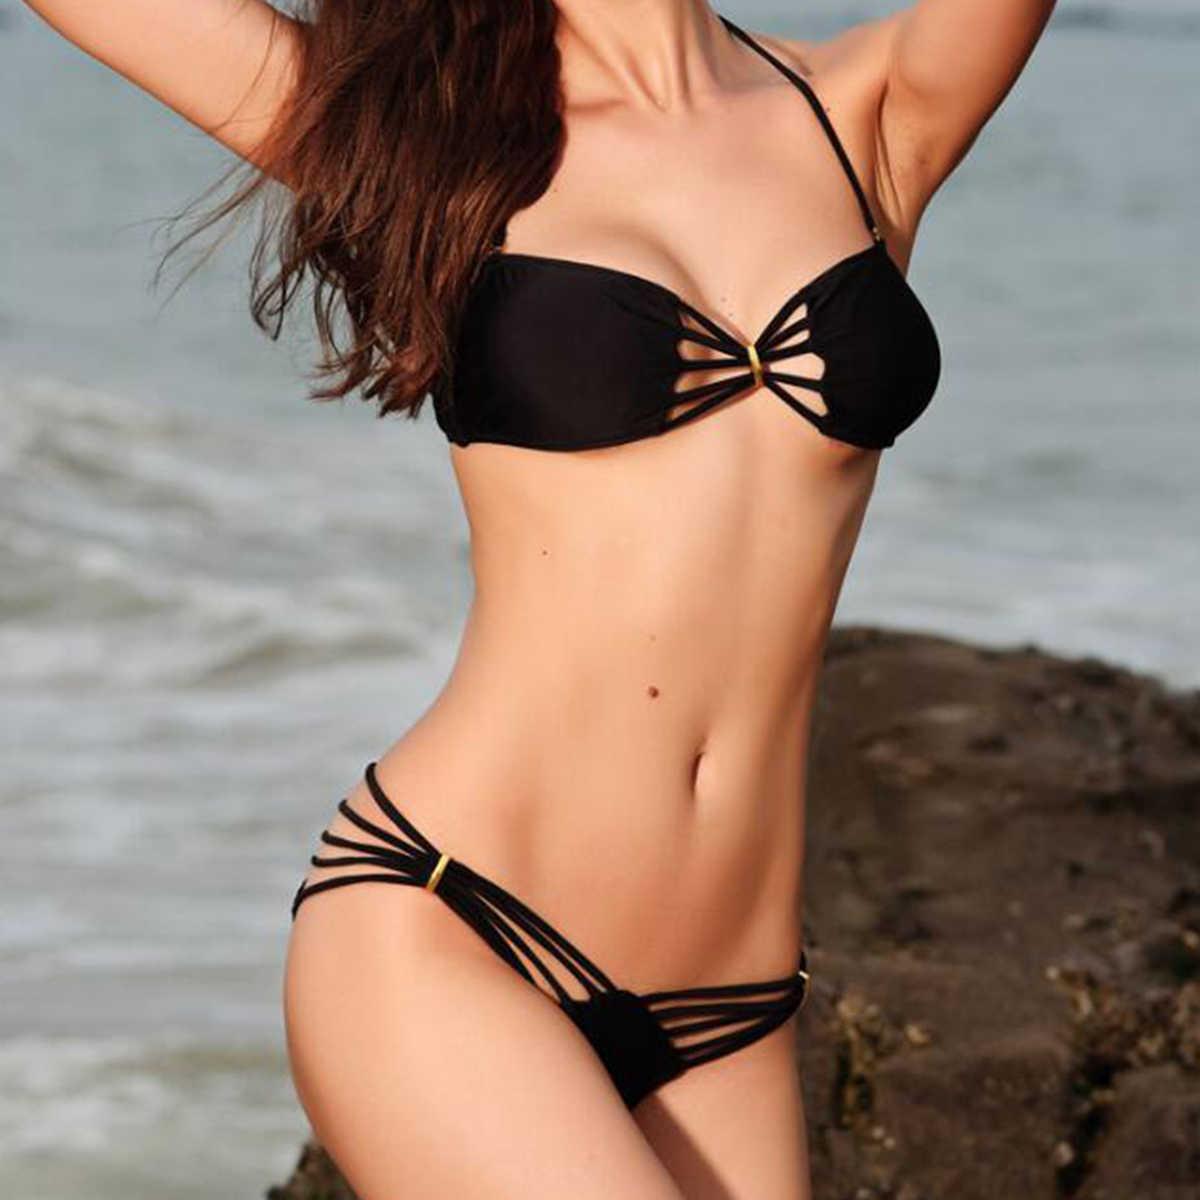 Wanita Sexy Perban Haltter Micro Brasil String Thong Pakaian Renang Mandi Bikini Set Pakaian Renang Cocok untuk Baju Renang